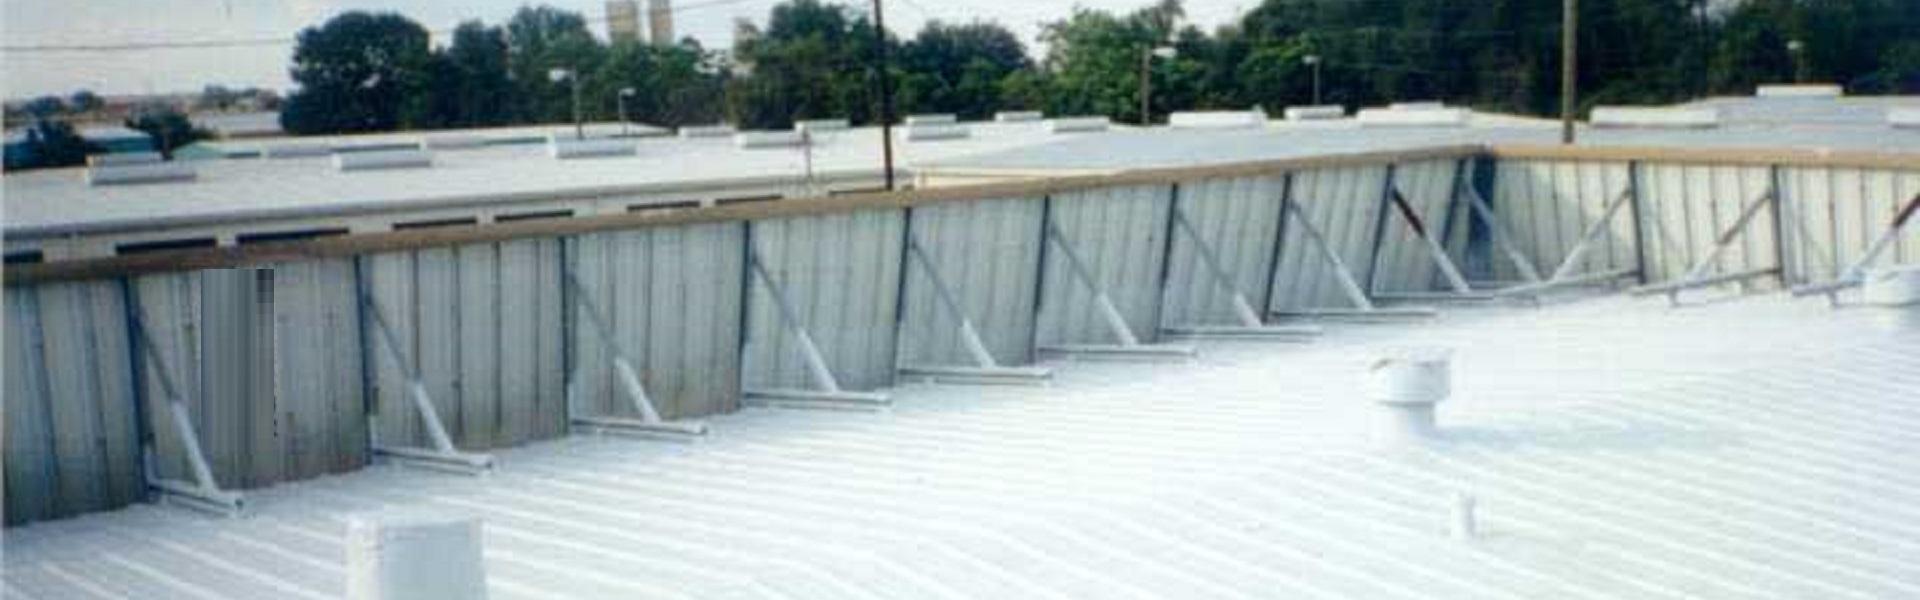 Spray On Silicone Roof Coating Houston